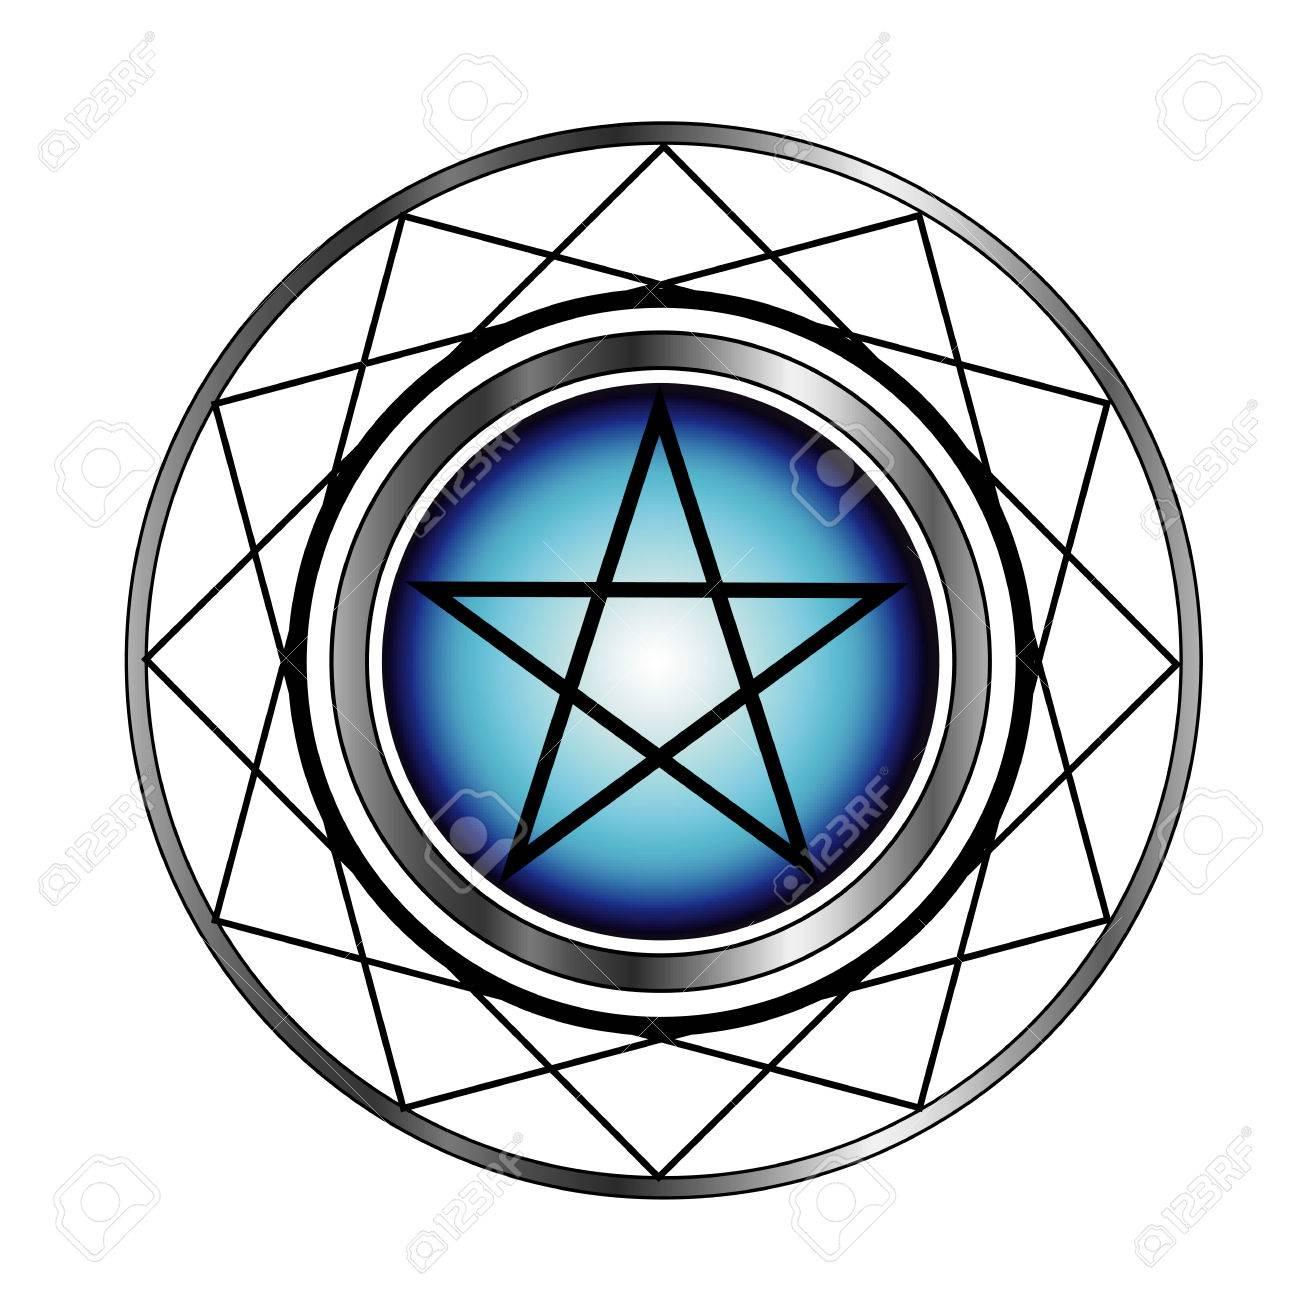 Pentacle Religious Symbol Satanism Royalty Free Cliparts Vectors